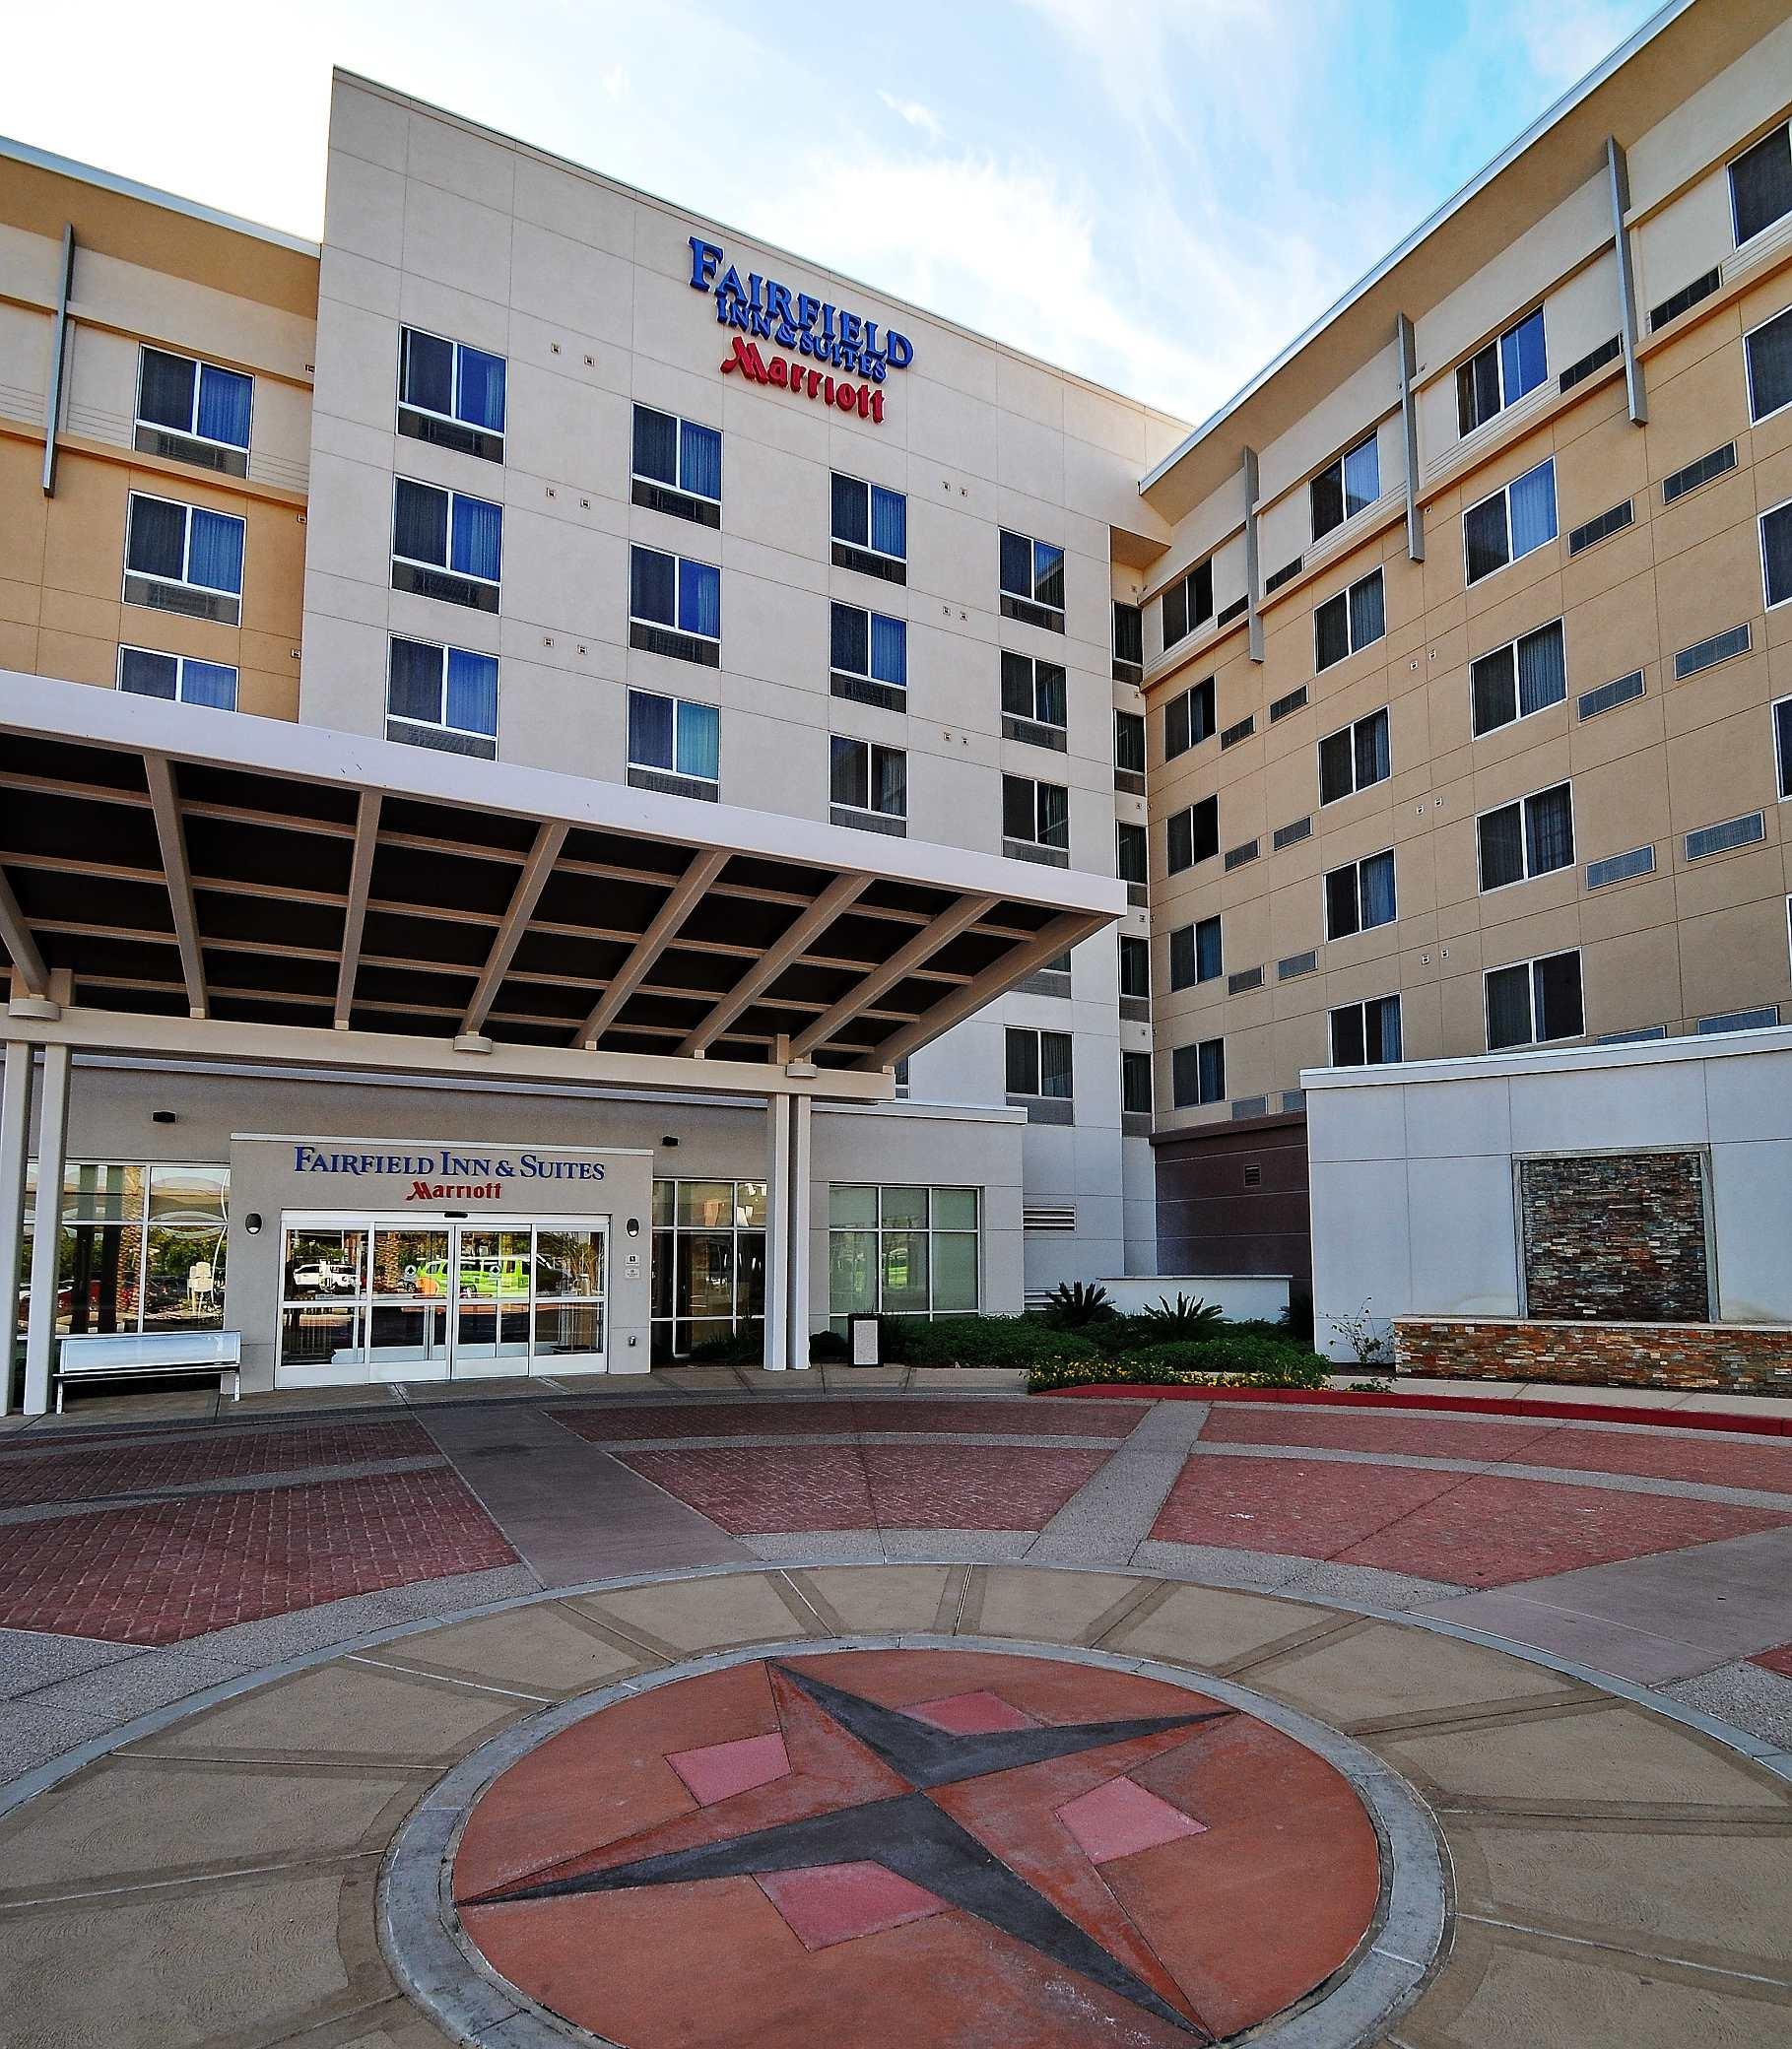 Fairfield Inn & Suites by Marriott Phoenix Chandler/Fashion Center image 10